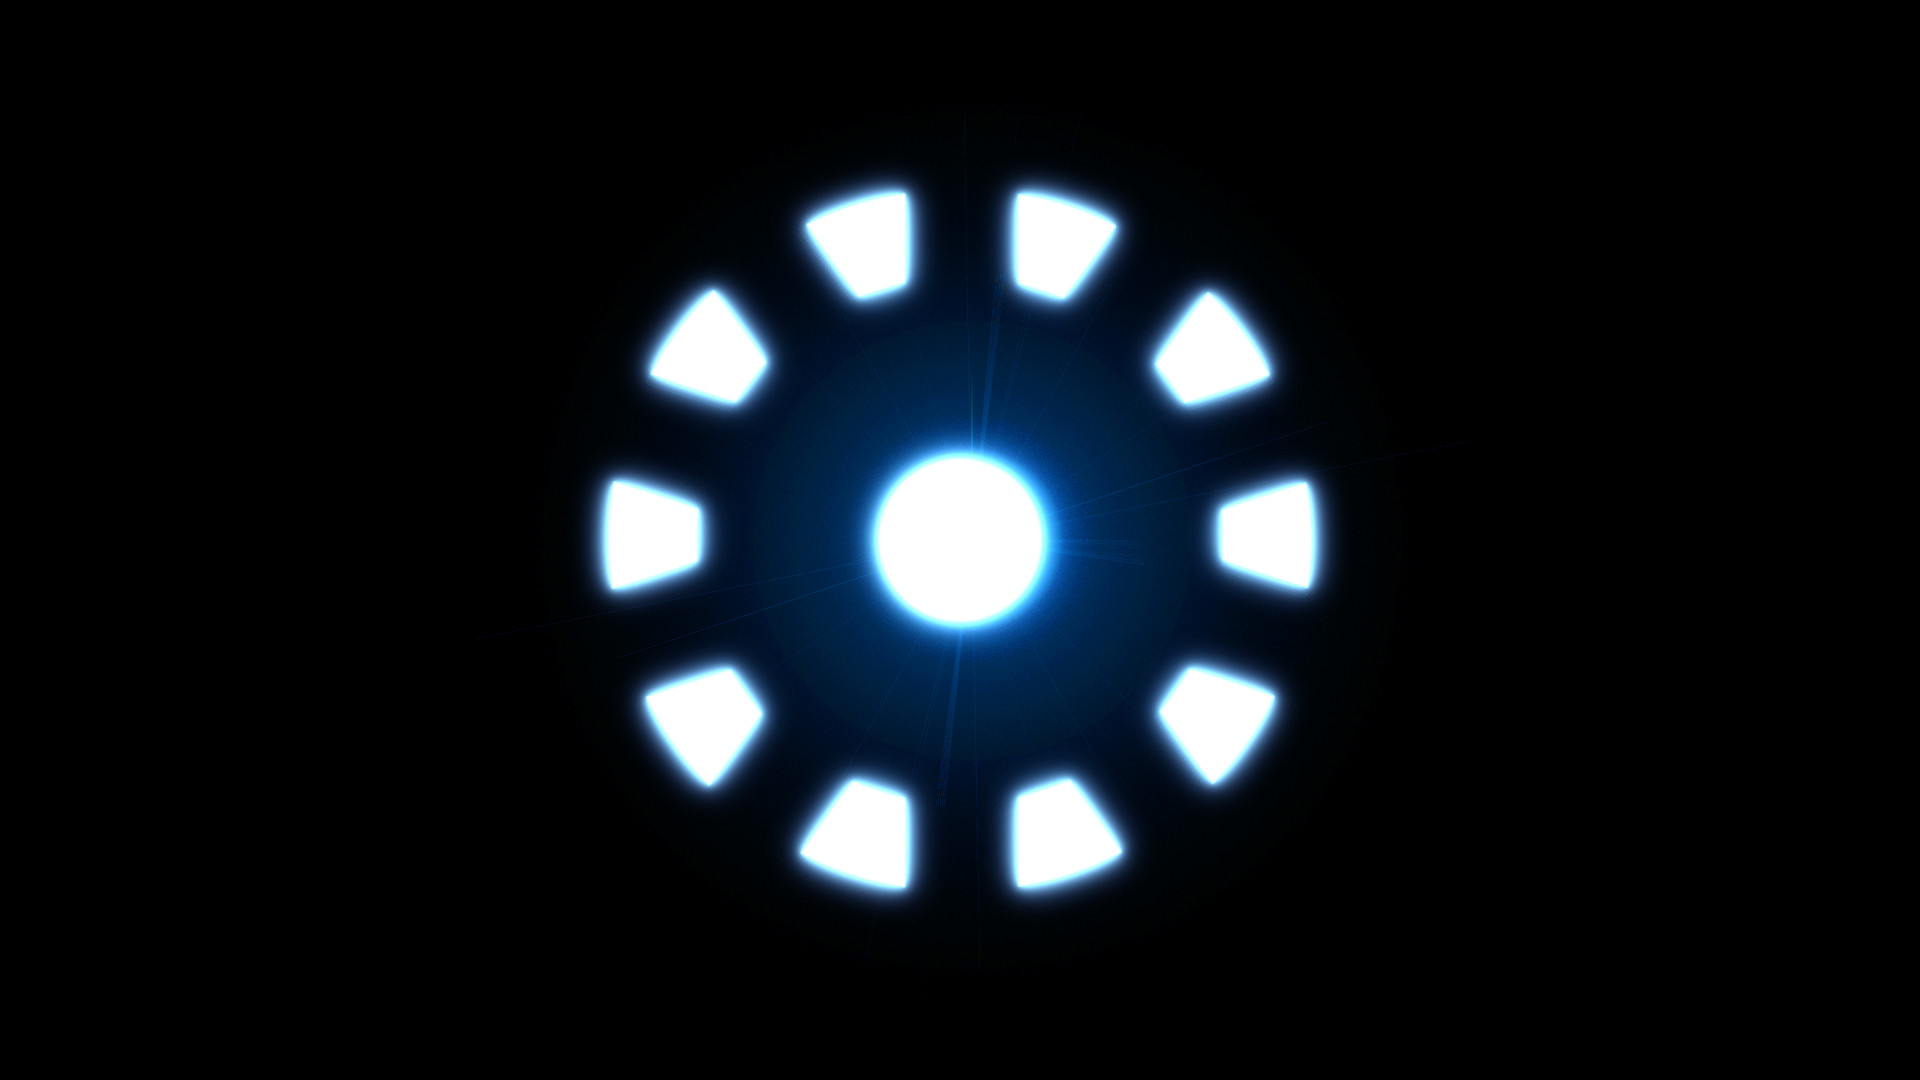 iron man screensaver background movie original 1920×1080